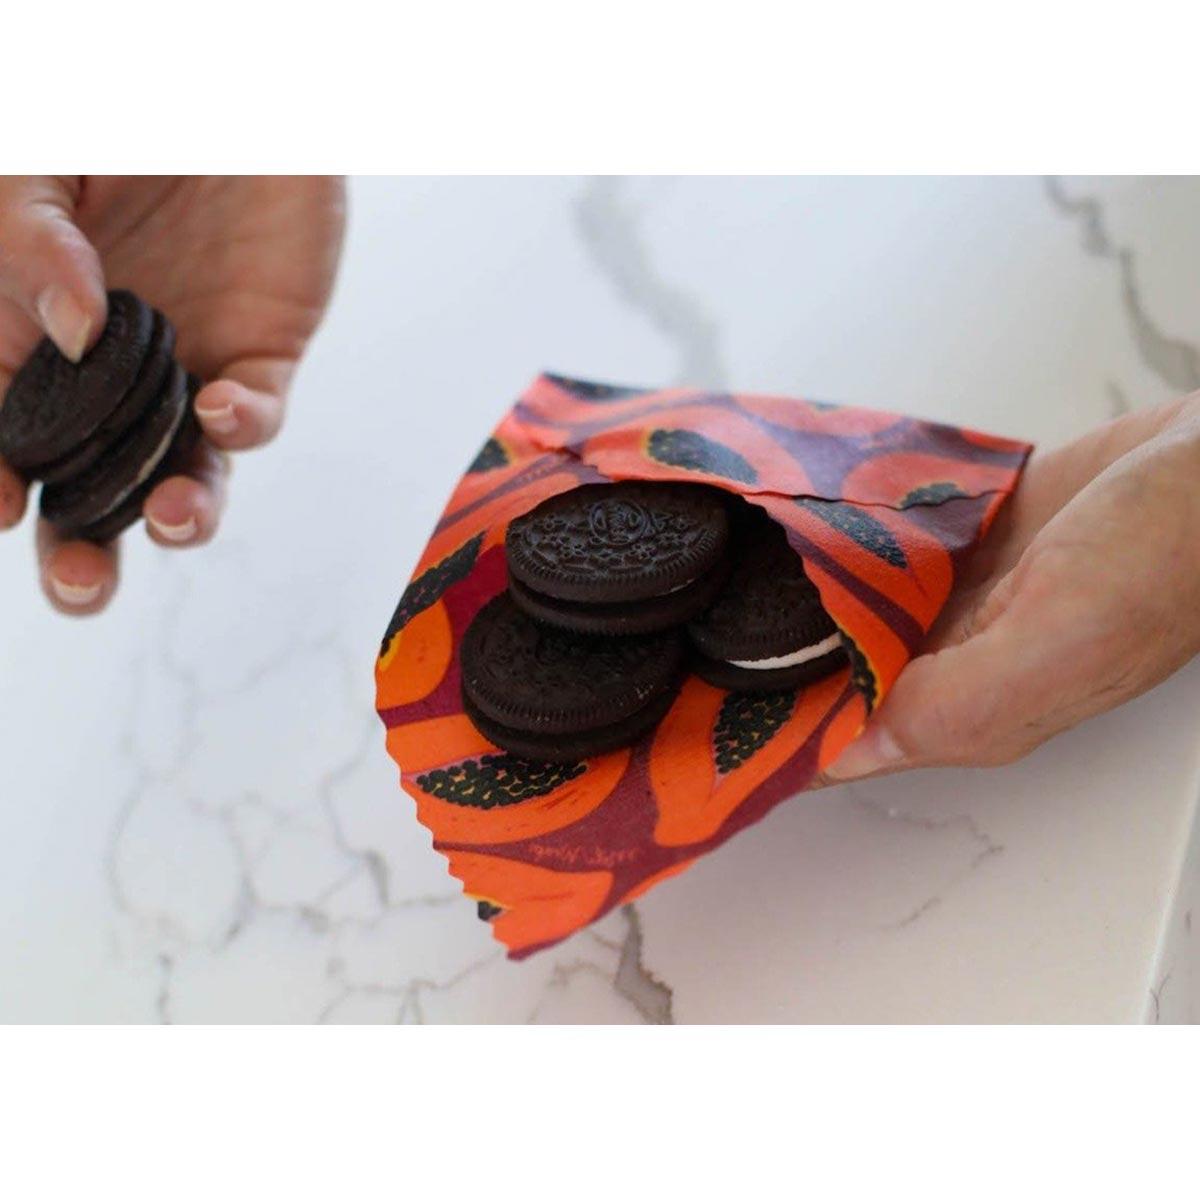 Meli Wraps 3-Pack (Sm/Med/Lrg) Reusable Beeswax Food Wrap, Purple Papaya Print